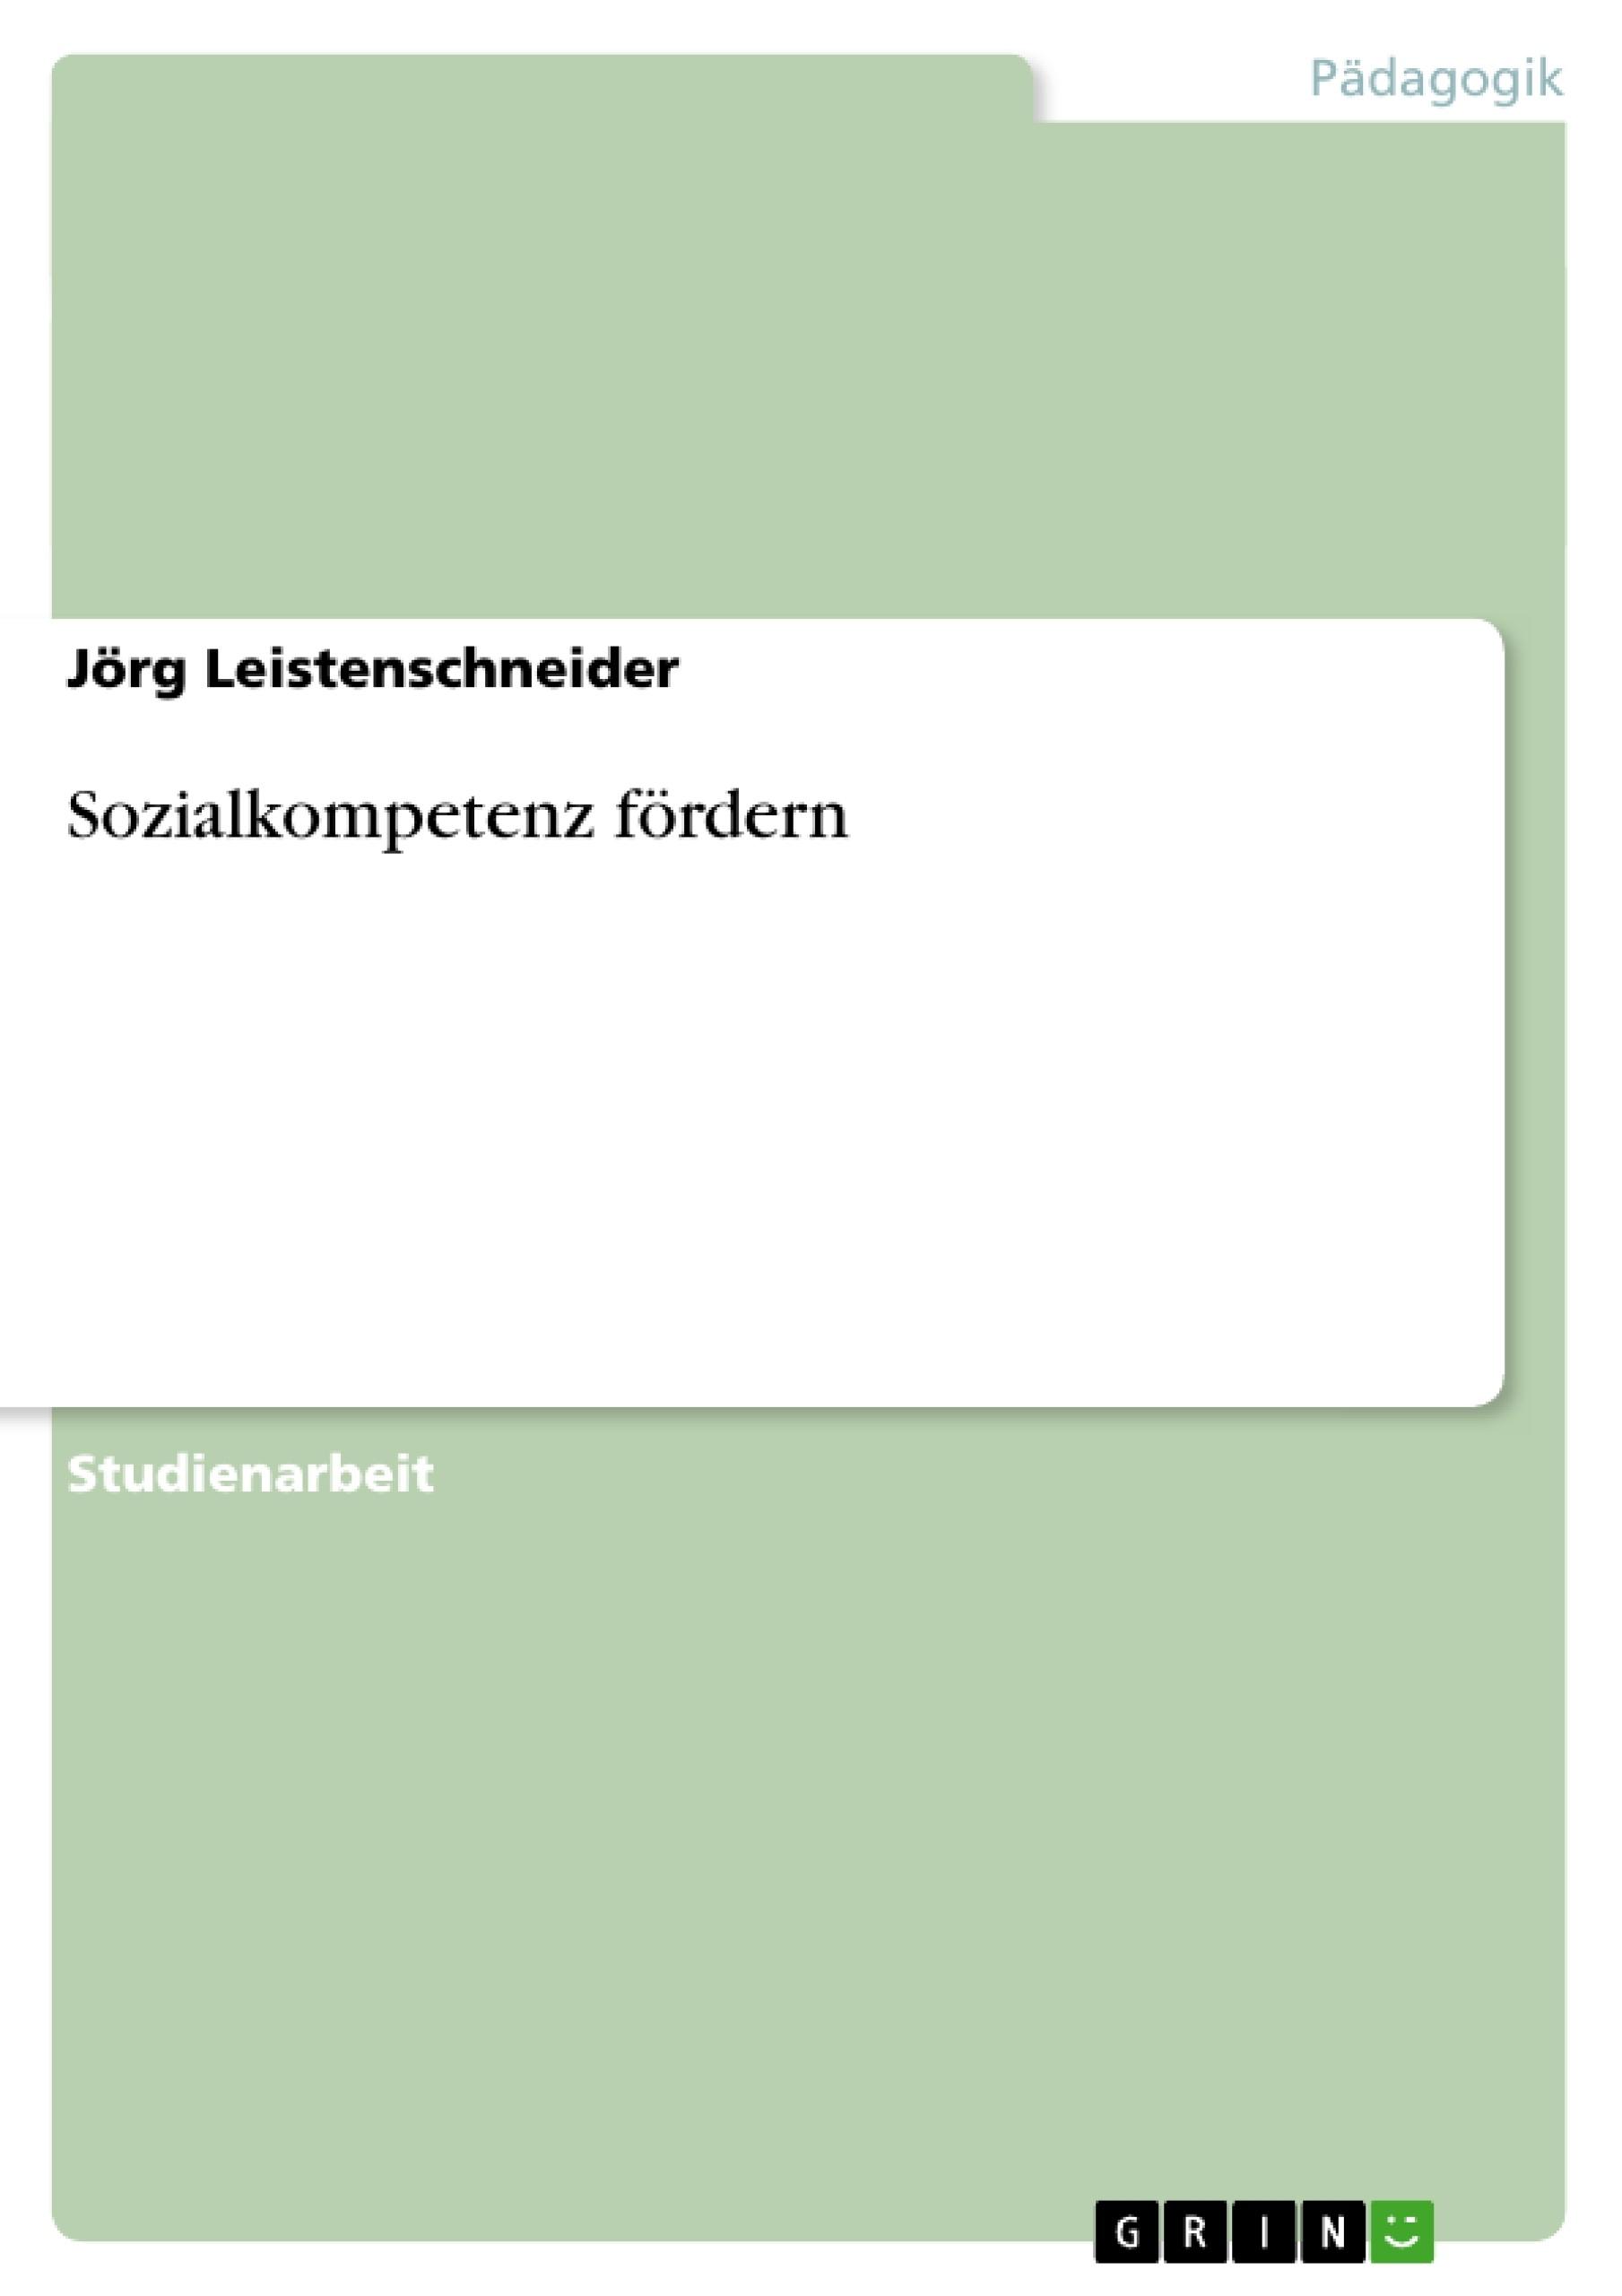 Titel: Sozialkompetenz fördern